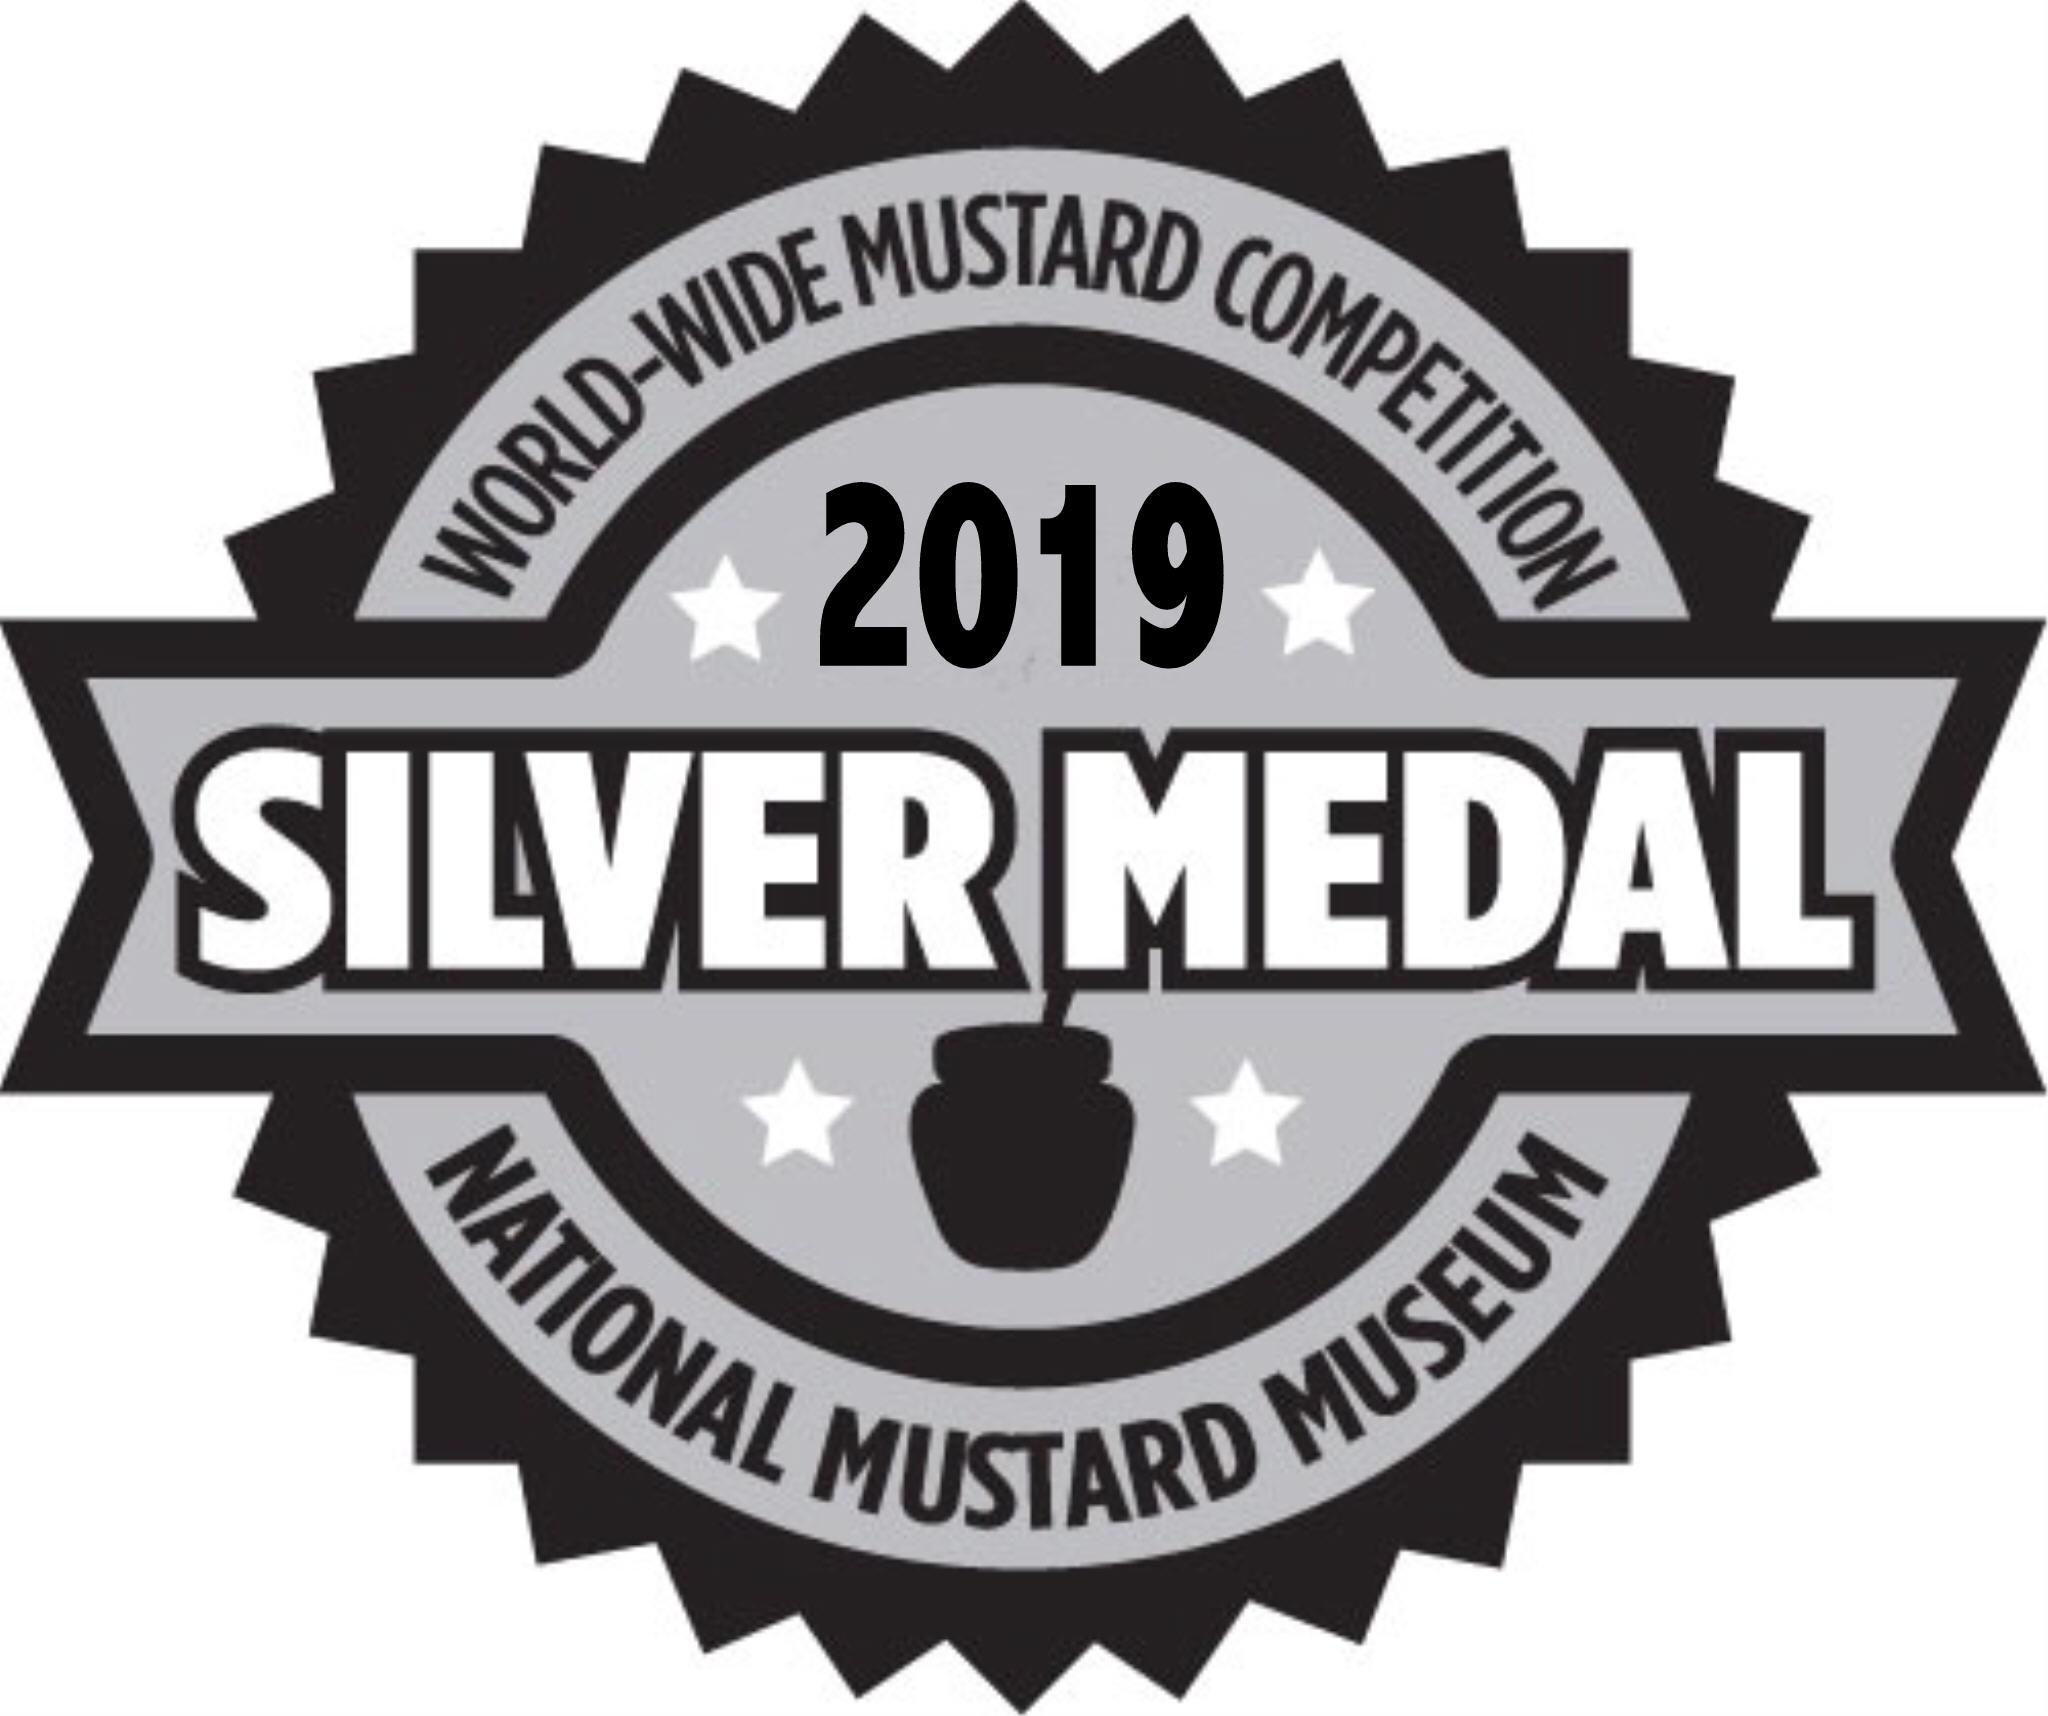 SilverMedal2019.jpg